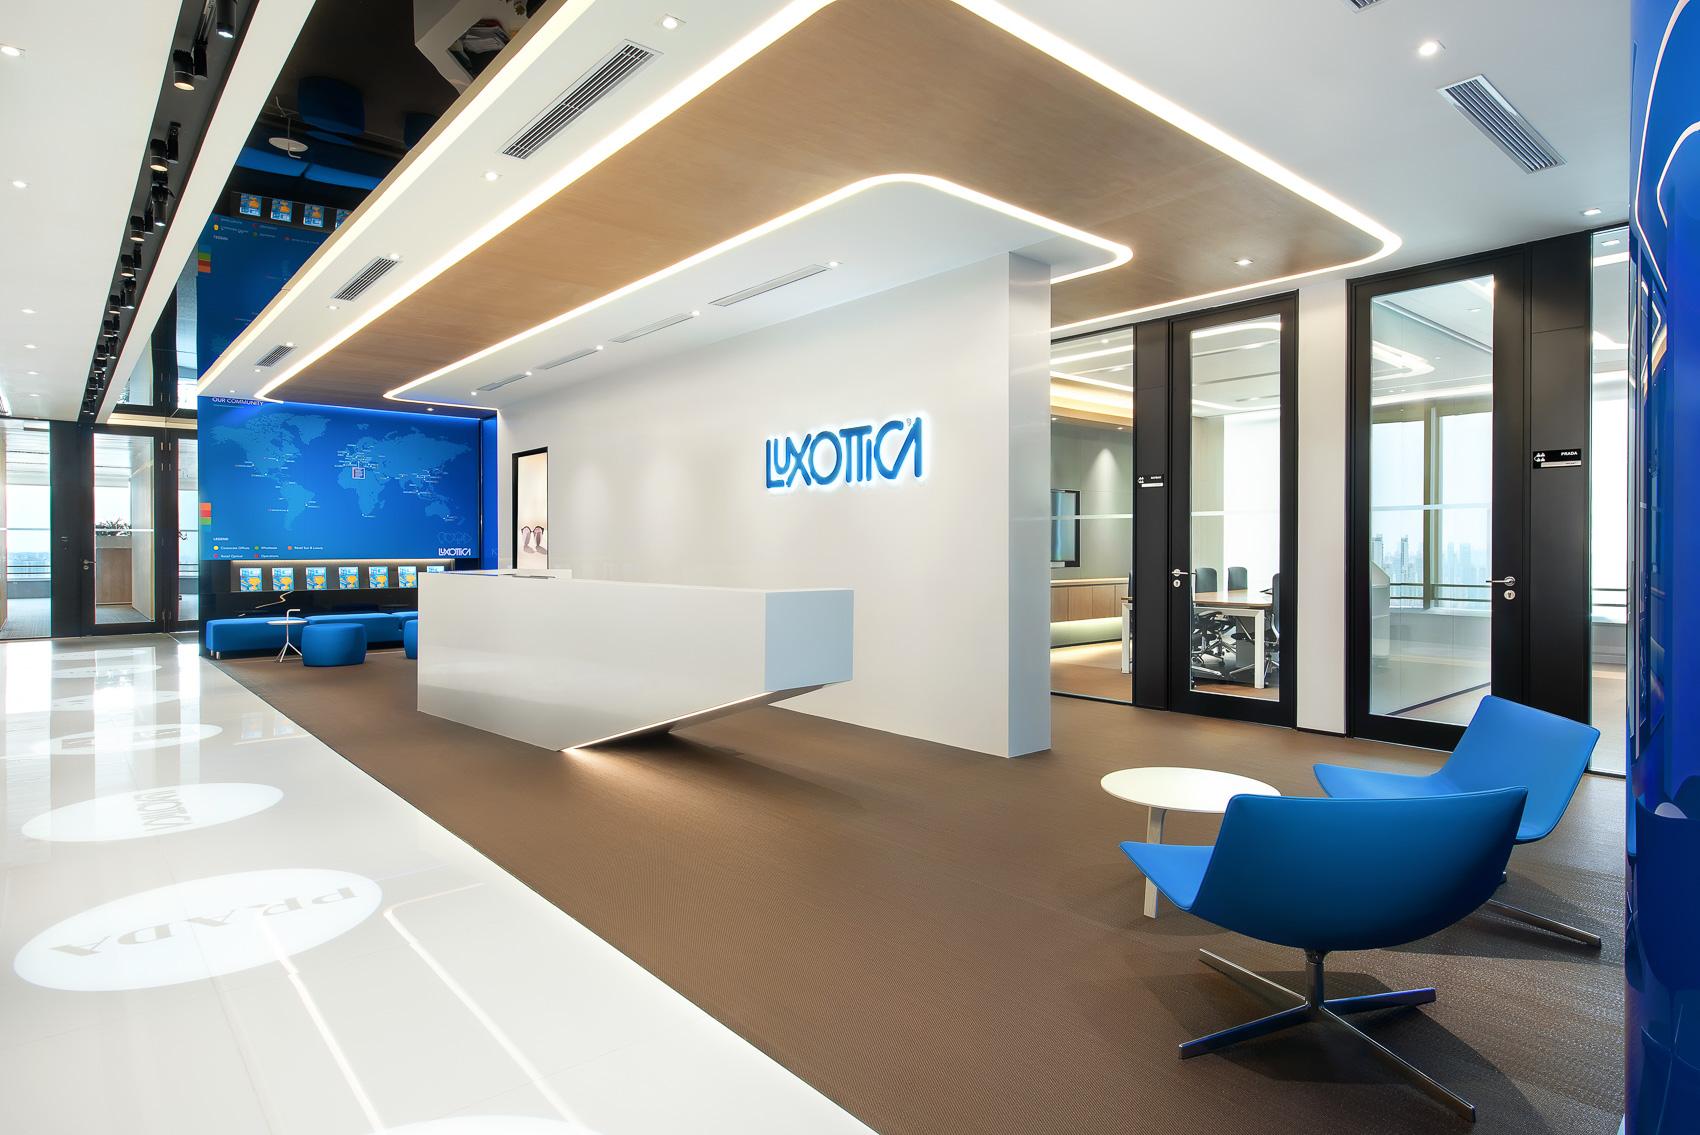 Luxottica Office